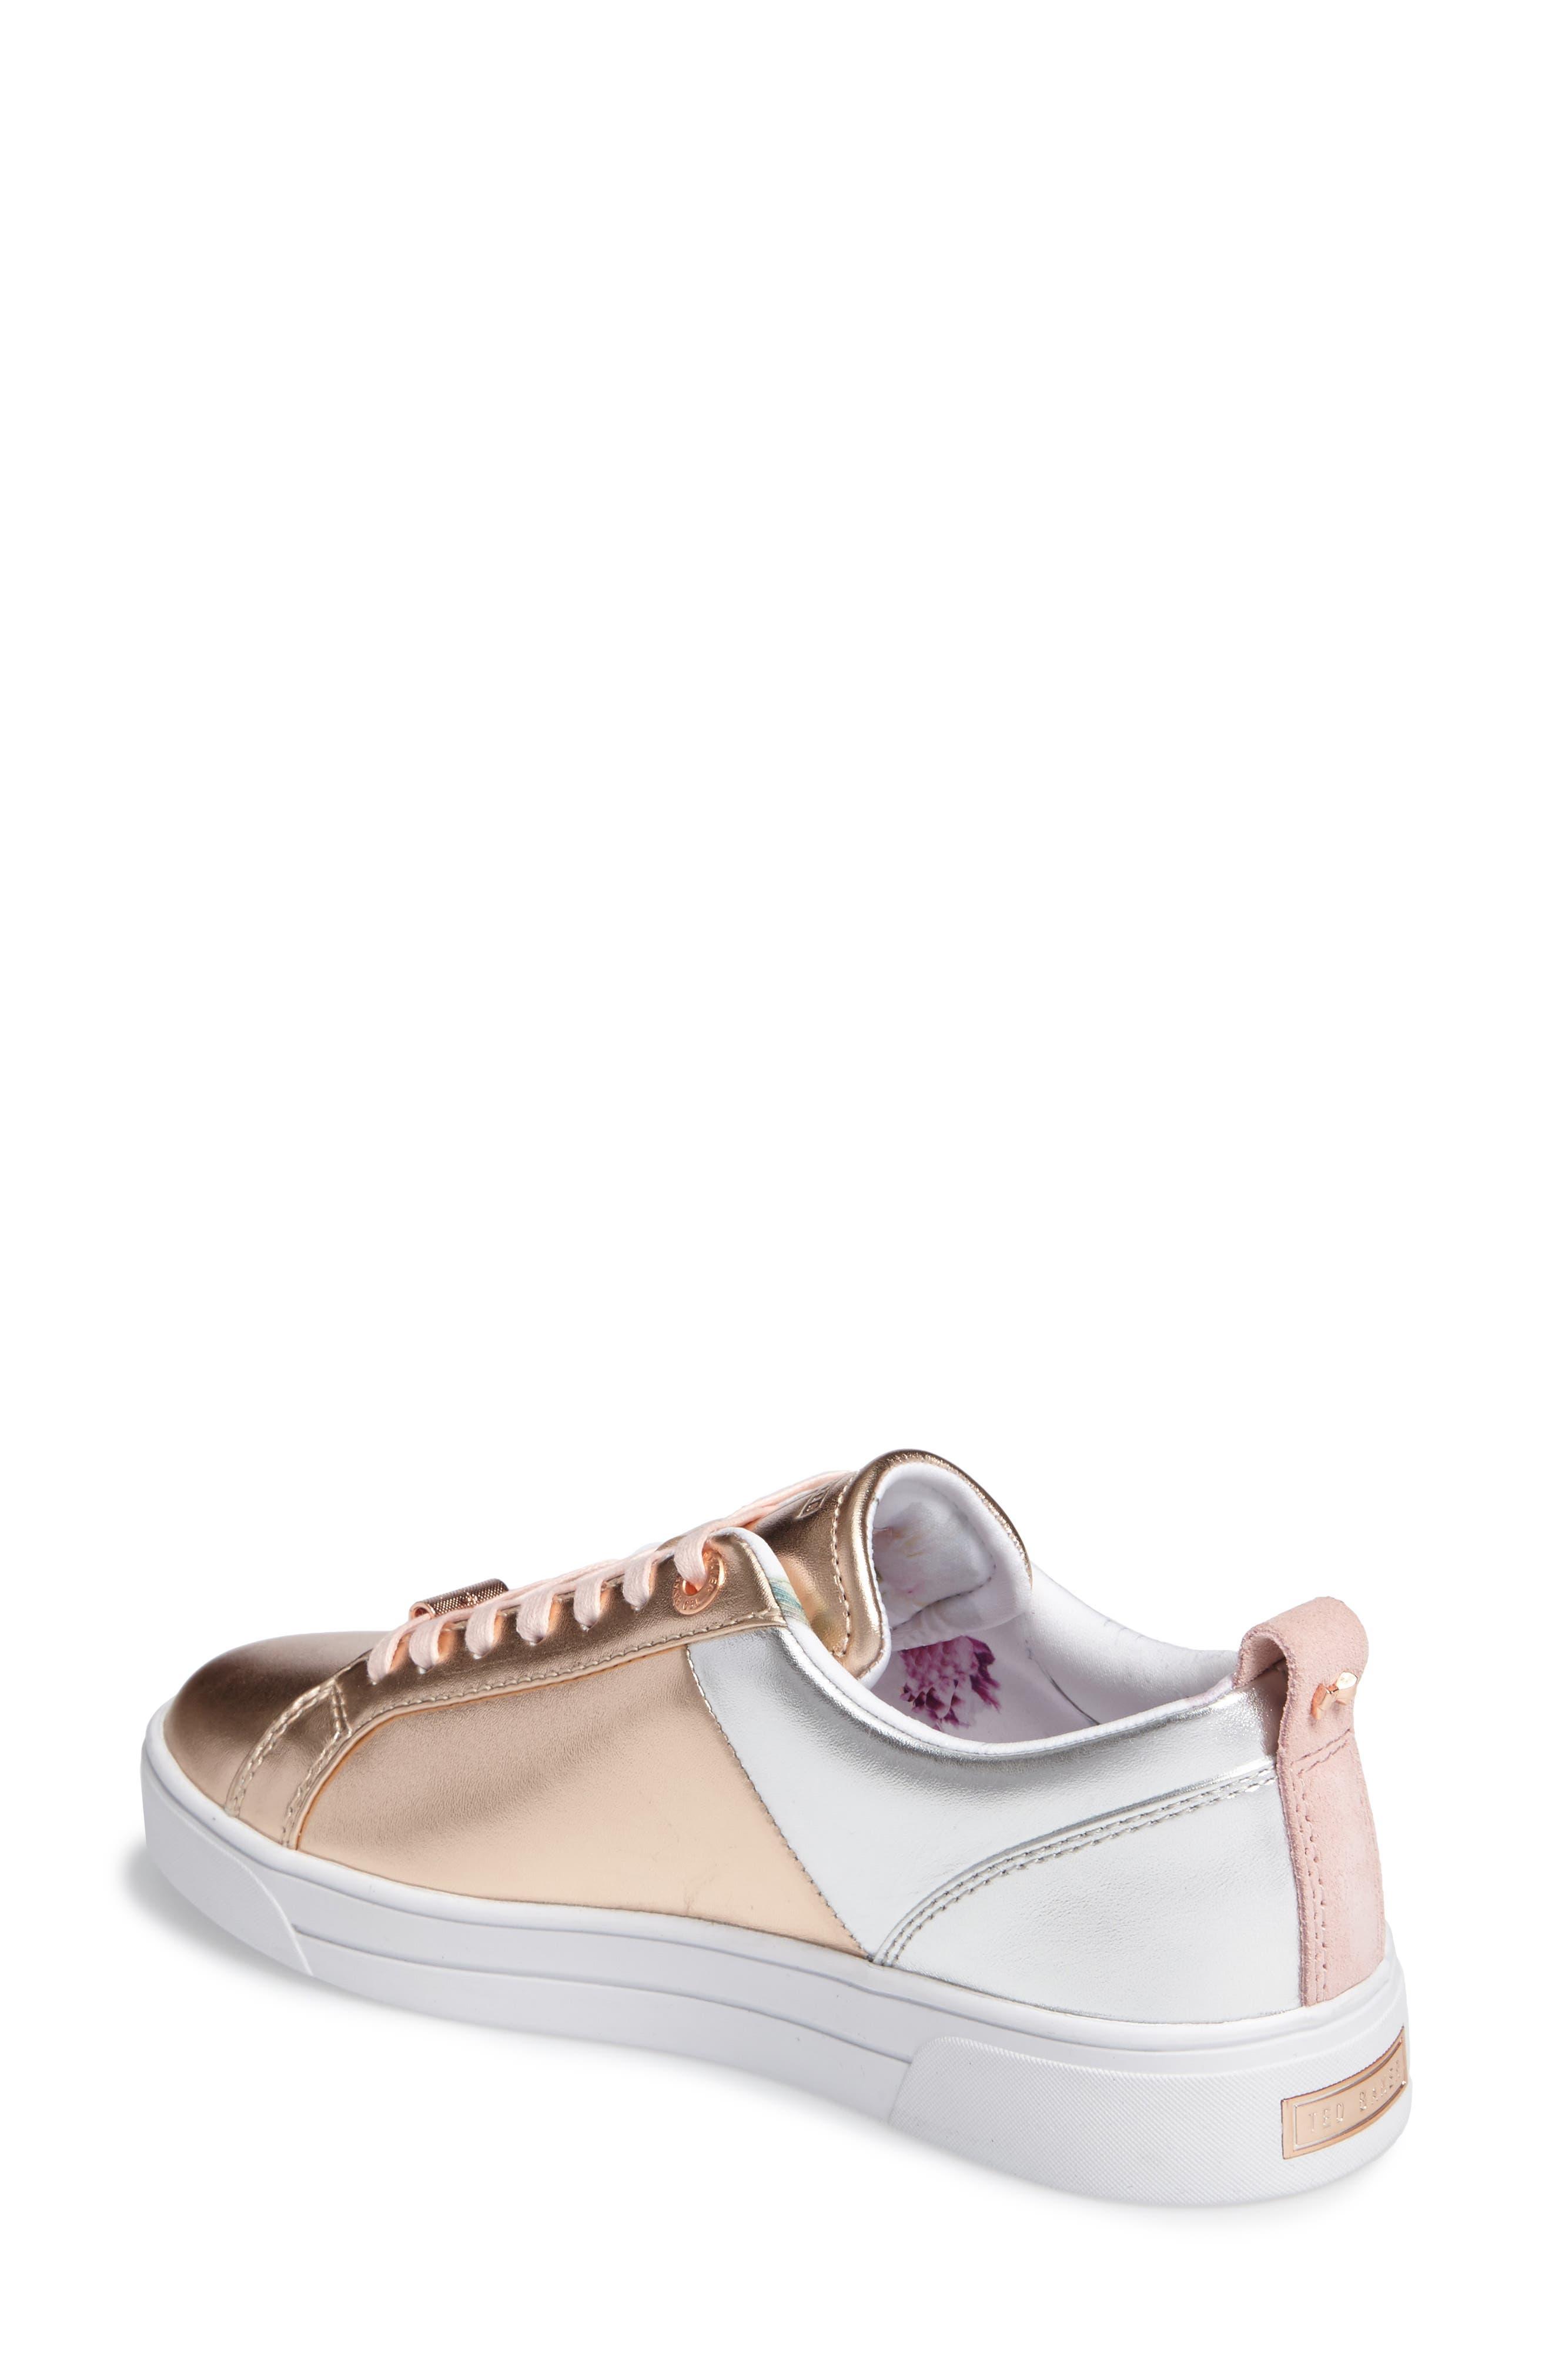 Kulei Lace-Up Sneaker,                             Alternate thumbnail 4, color,